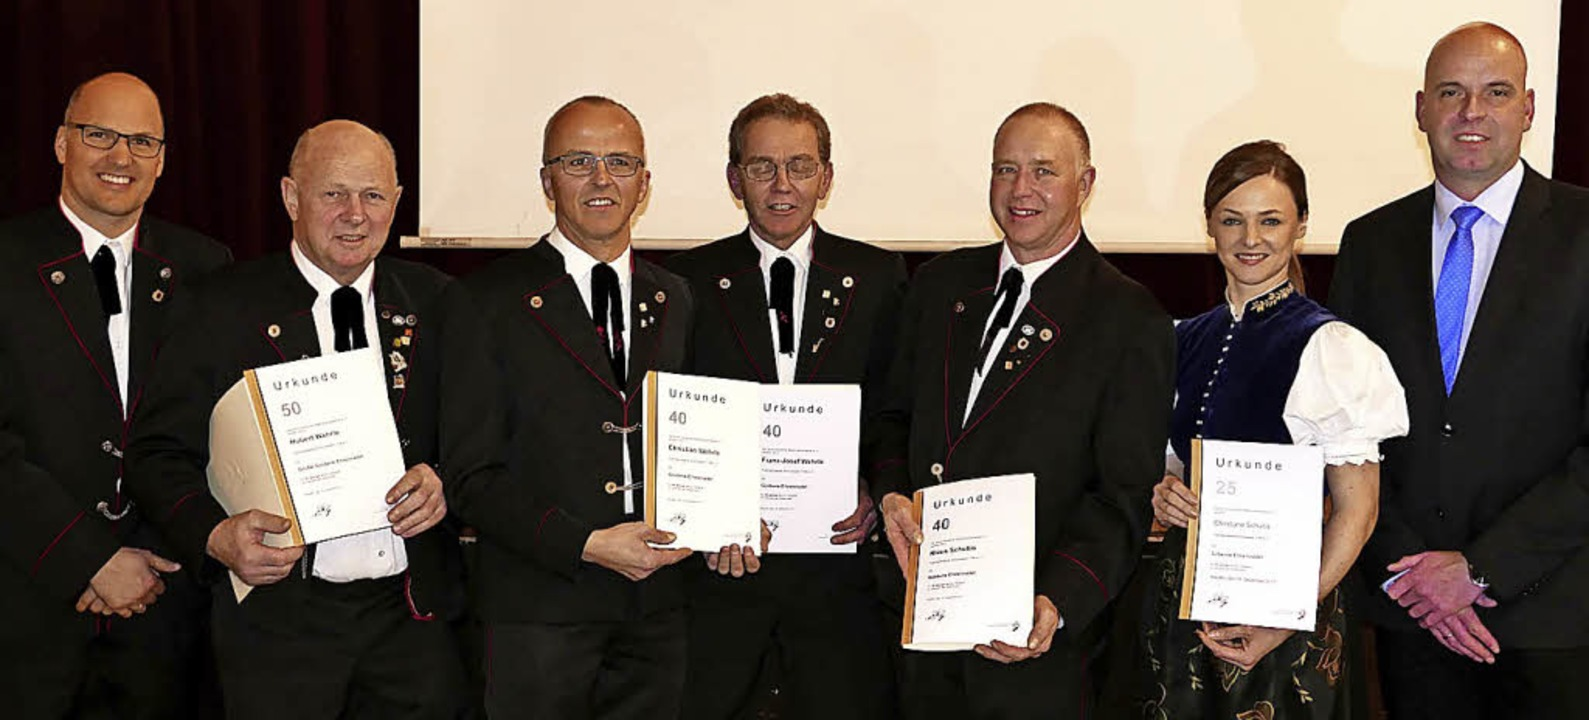 Bürgermeister Stephan Schonefeld (rech...Christiane Schultis (25, von links)).   | Foto: Horst Dauenhauer